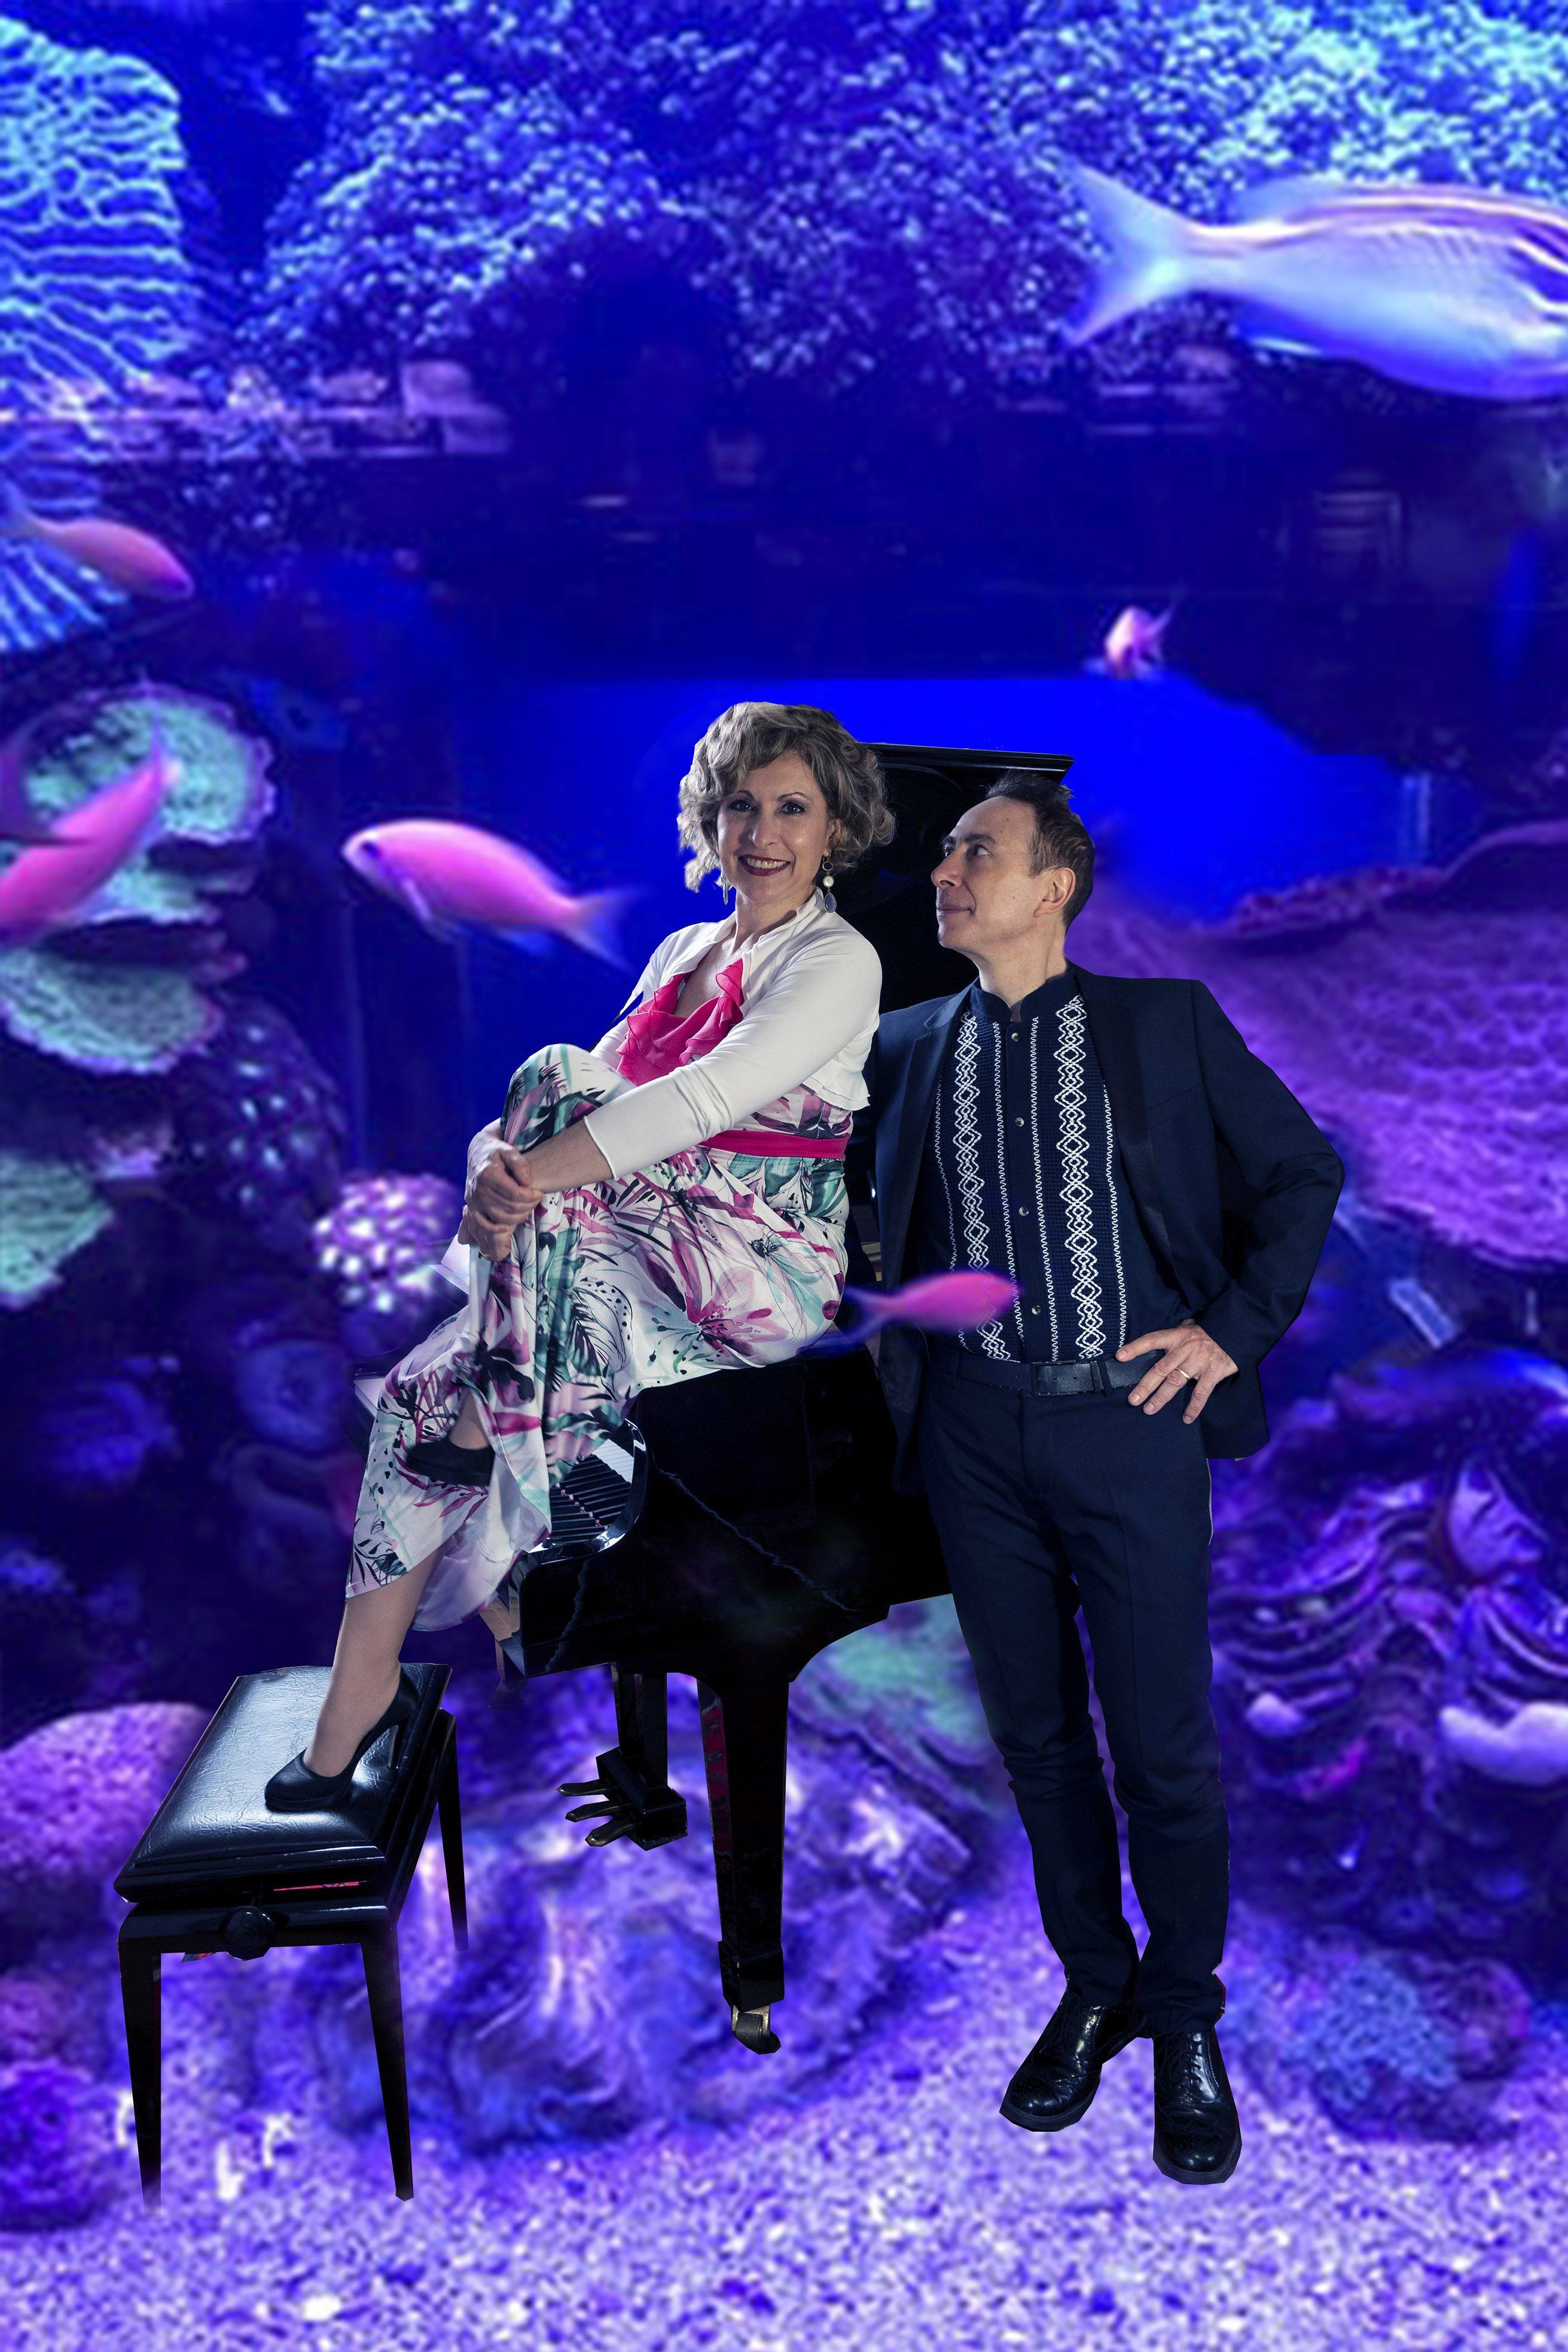 Duo Alterno nell'acquario _ mediumres